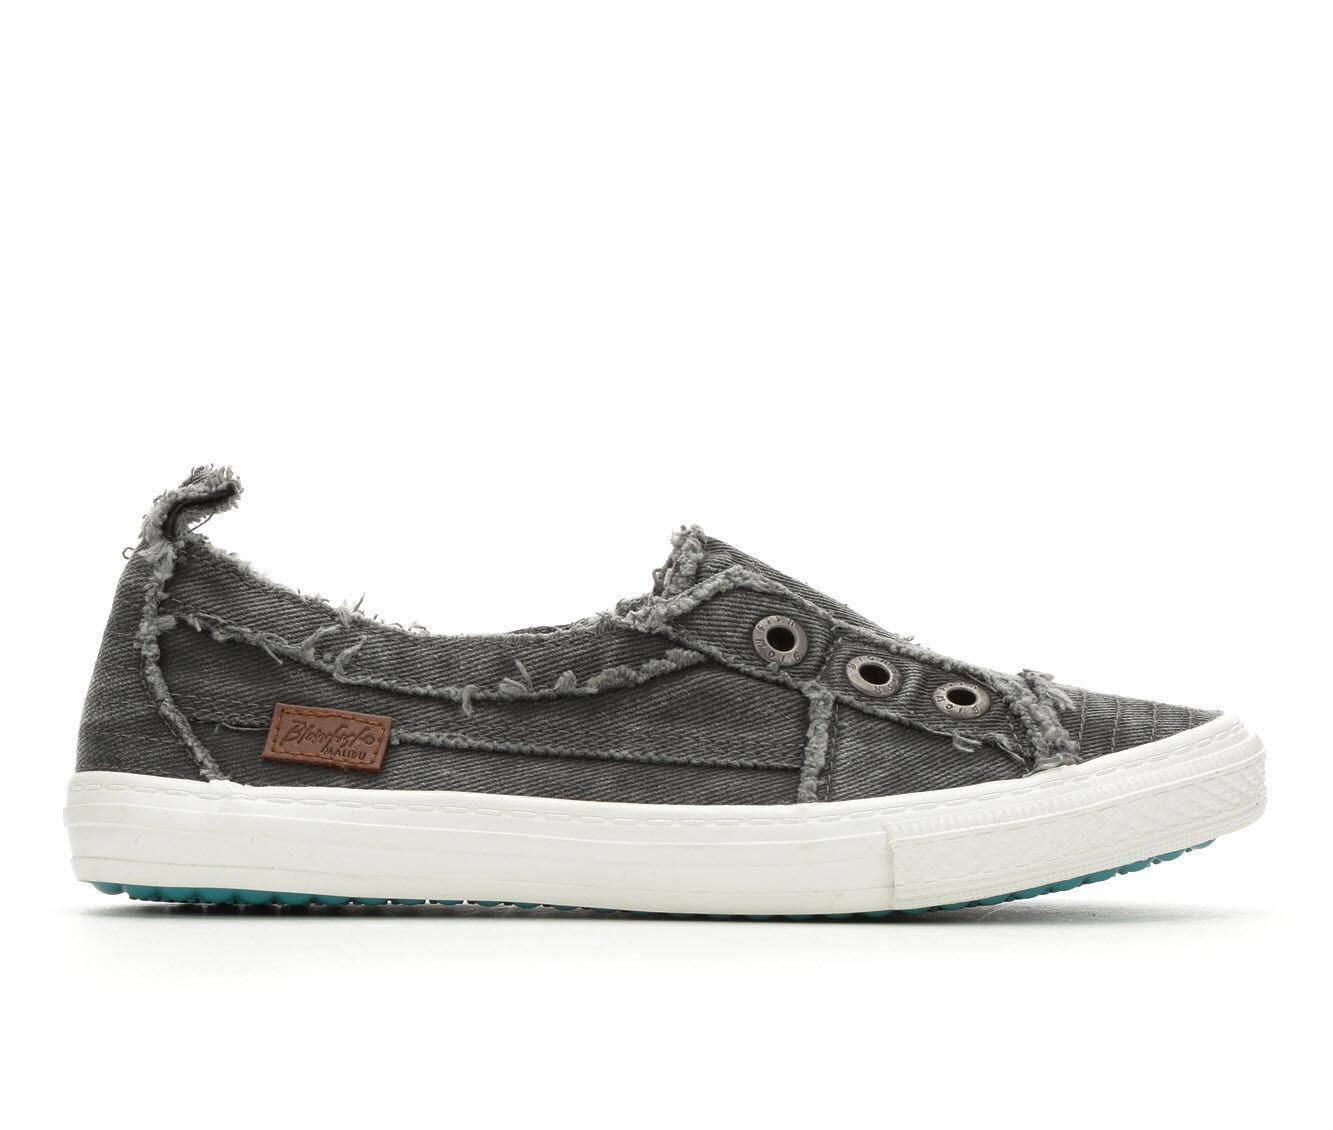 Women's Blowfish Malibu Aussie Slip-On Sneakers Dirty Grey